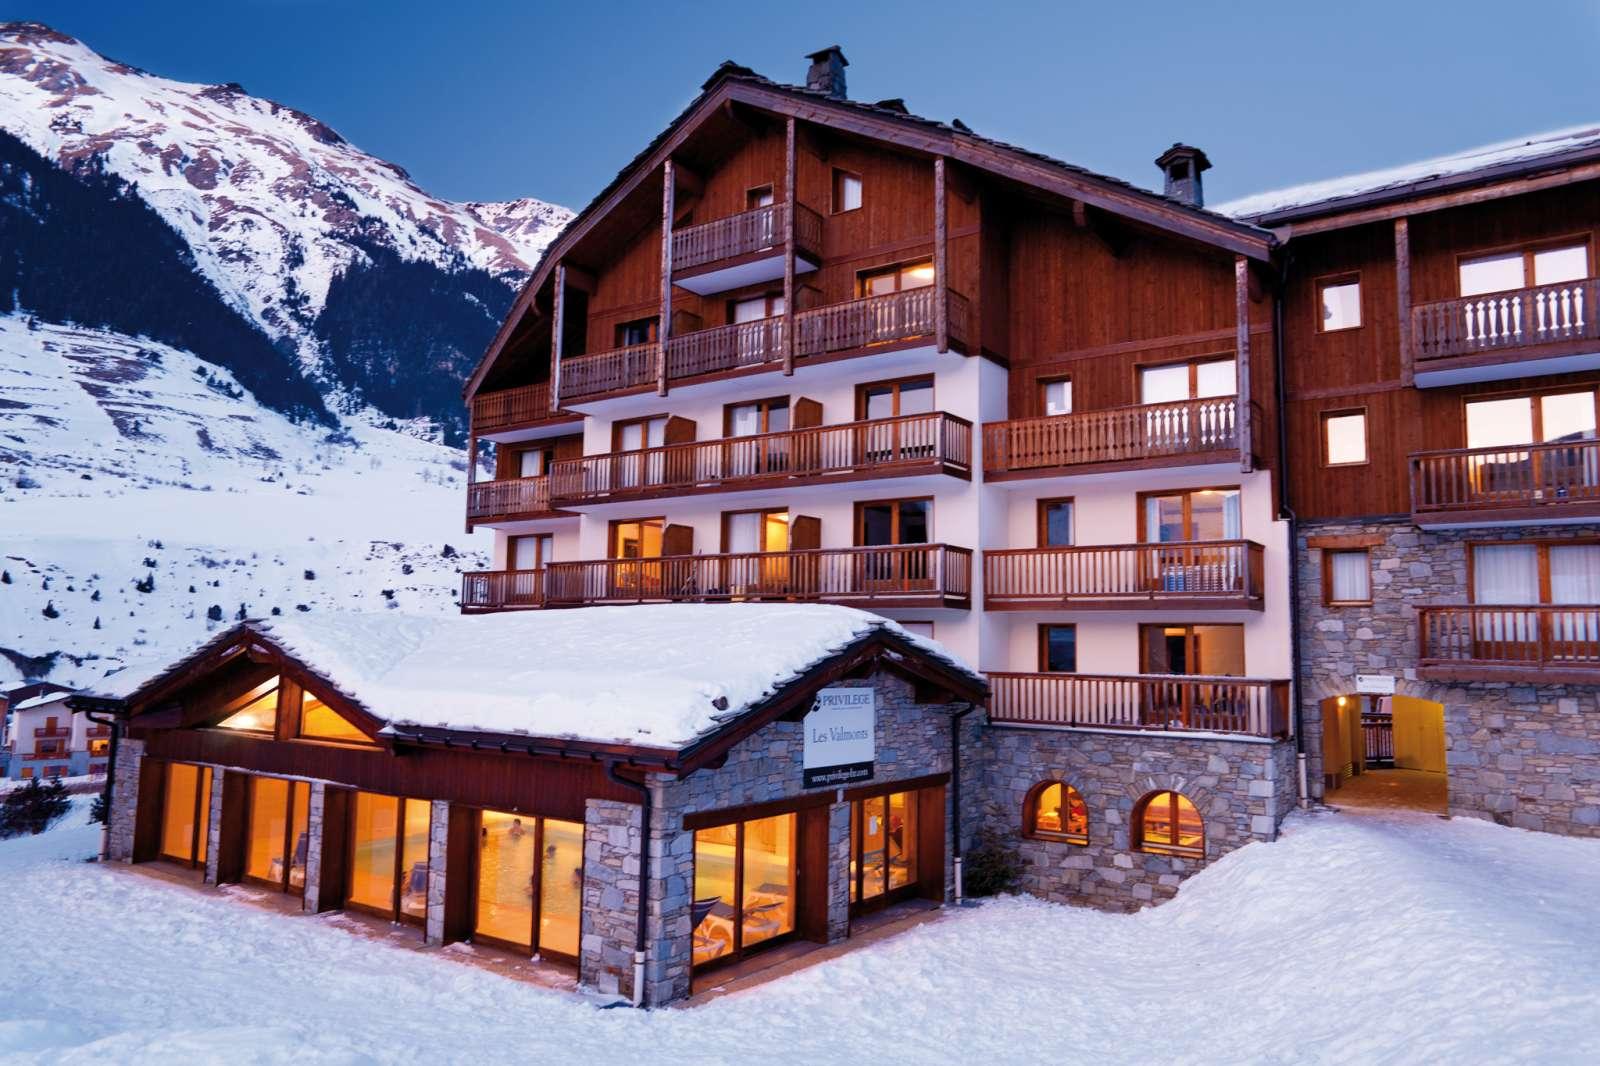 Chalet pas cher ski - val cenis séjour